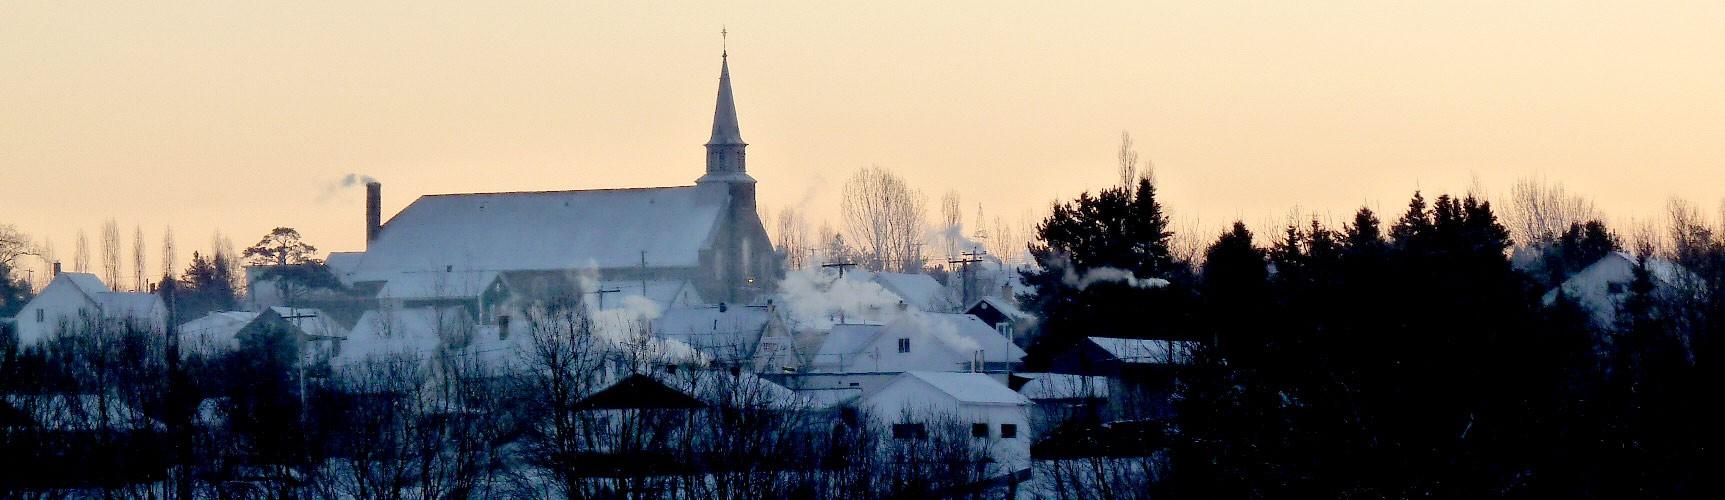 Héro - Village le soir